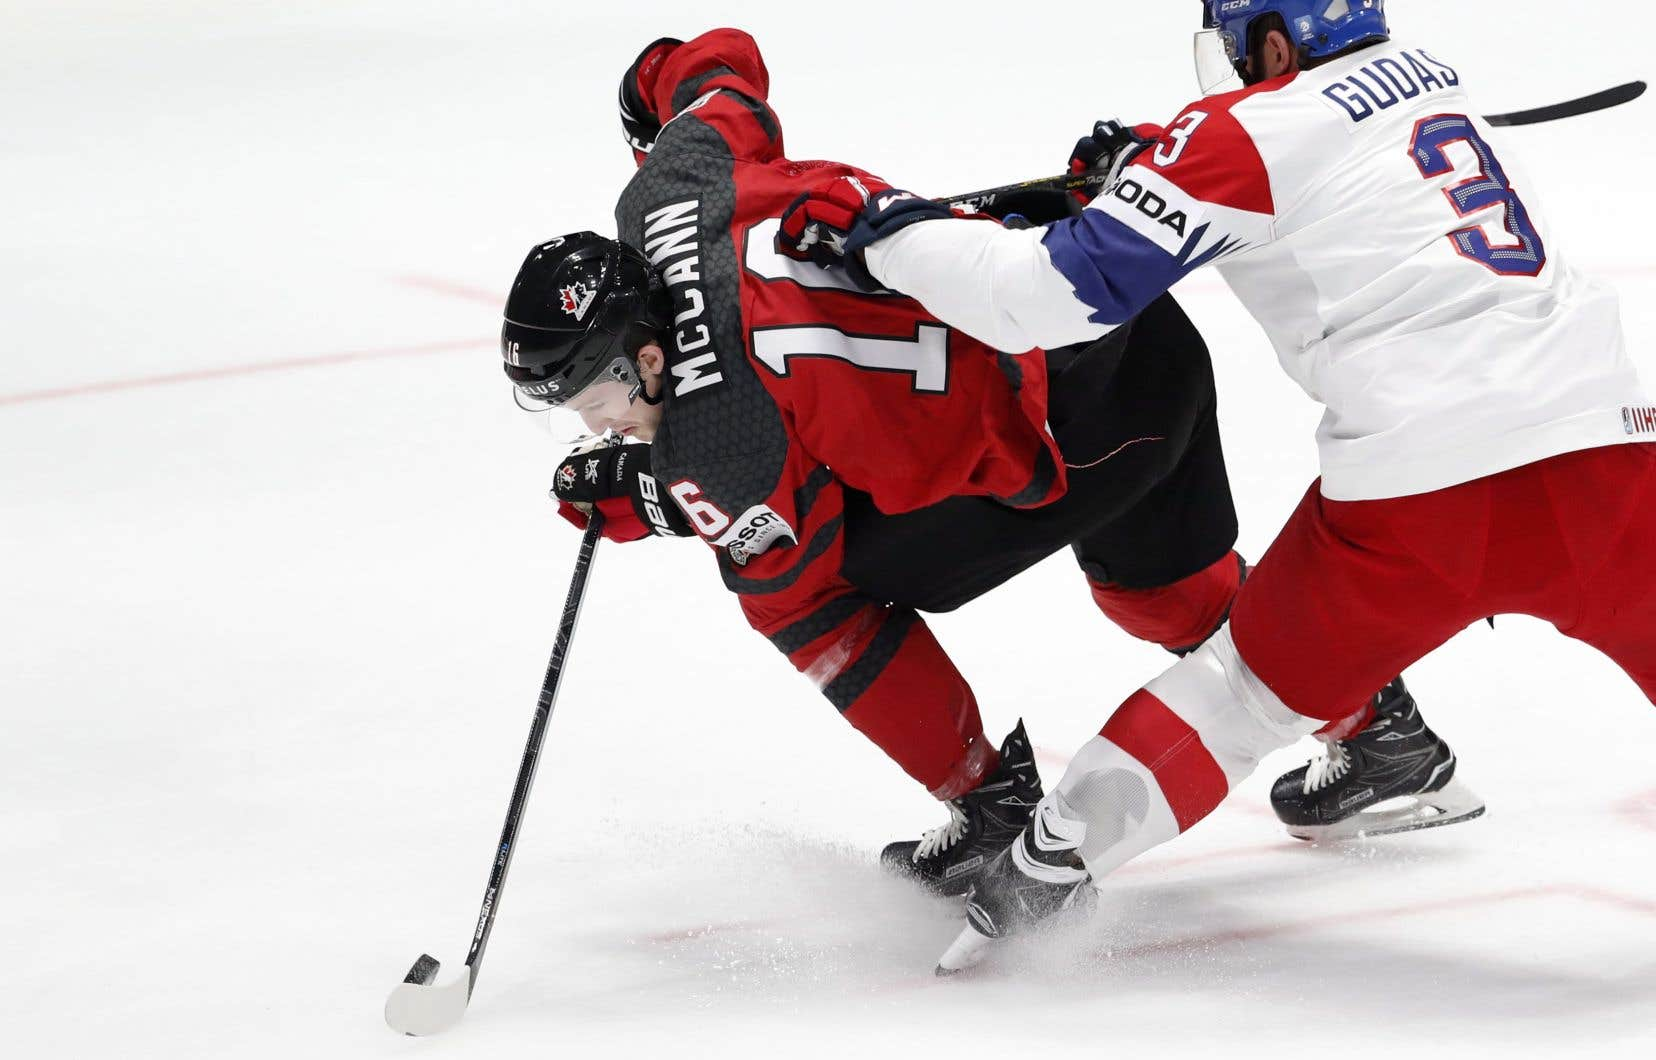 Le Canada a battu la République tchèque 5-1, samedi.